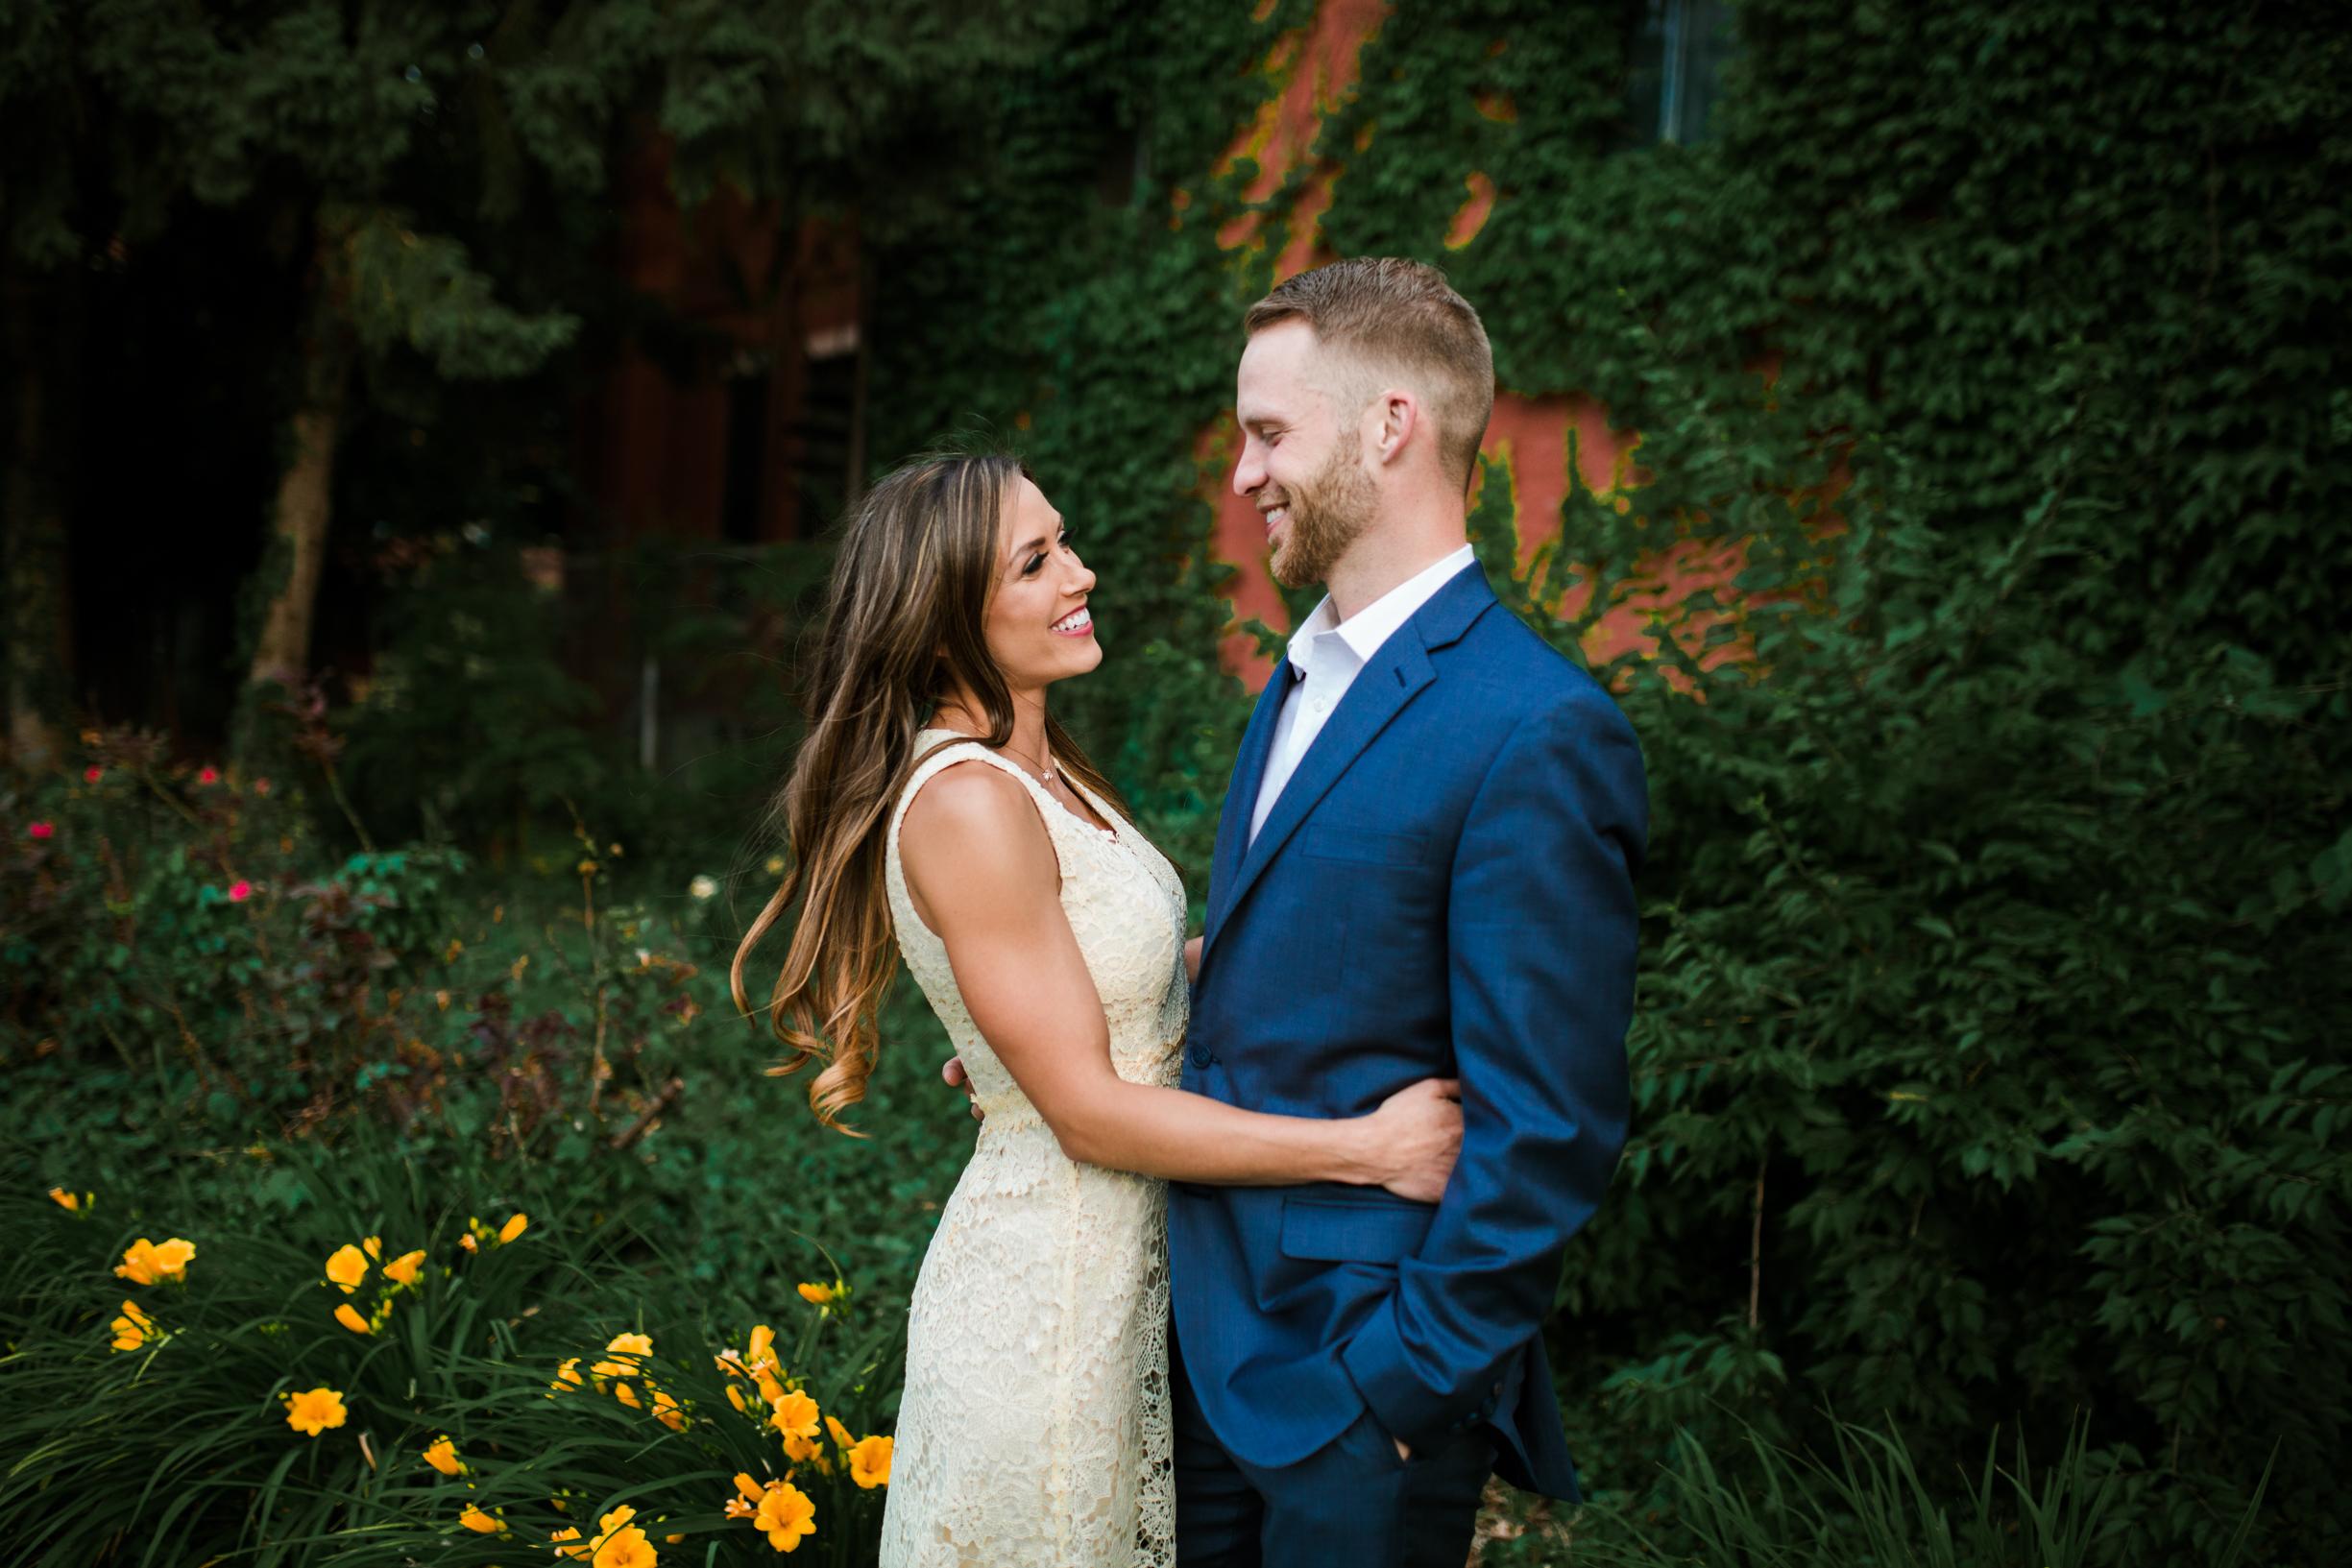 Victoria & Chad Engagement 2018 Crystal Ludwick Photo Louisville Kentucky Wedding Photographer WEBSITE (29 of 48).jpg